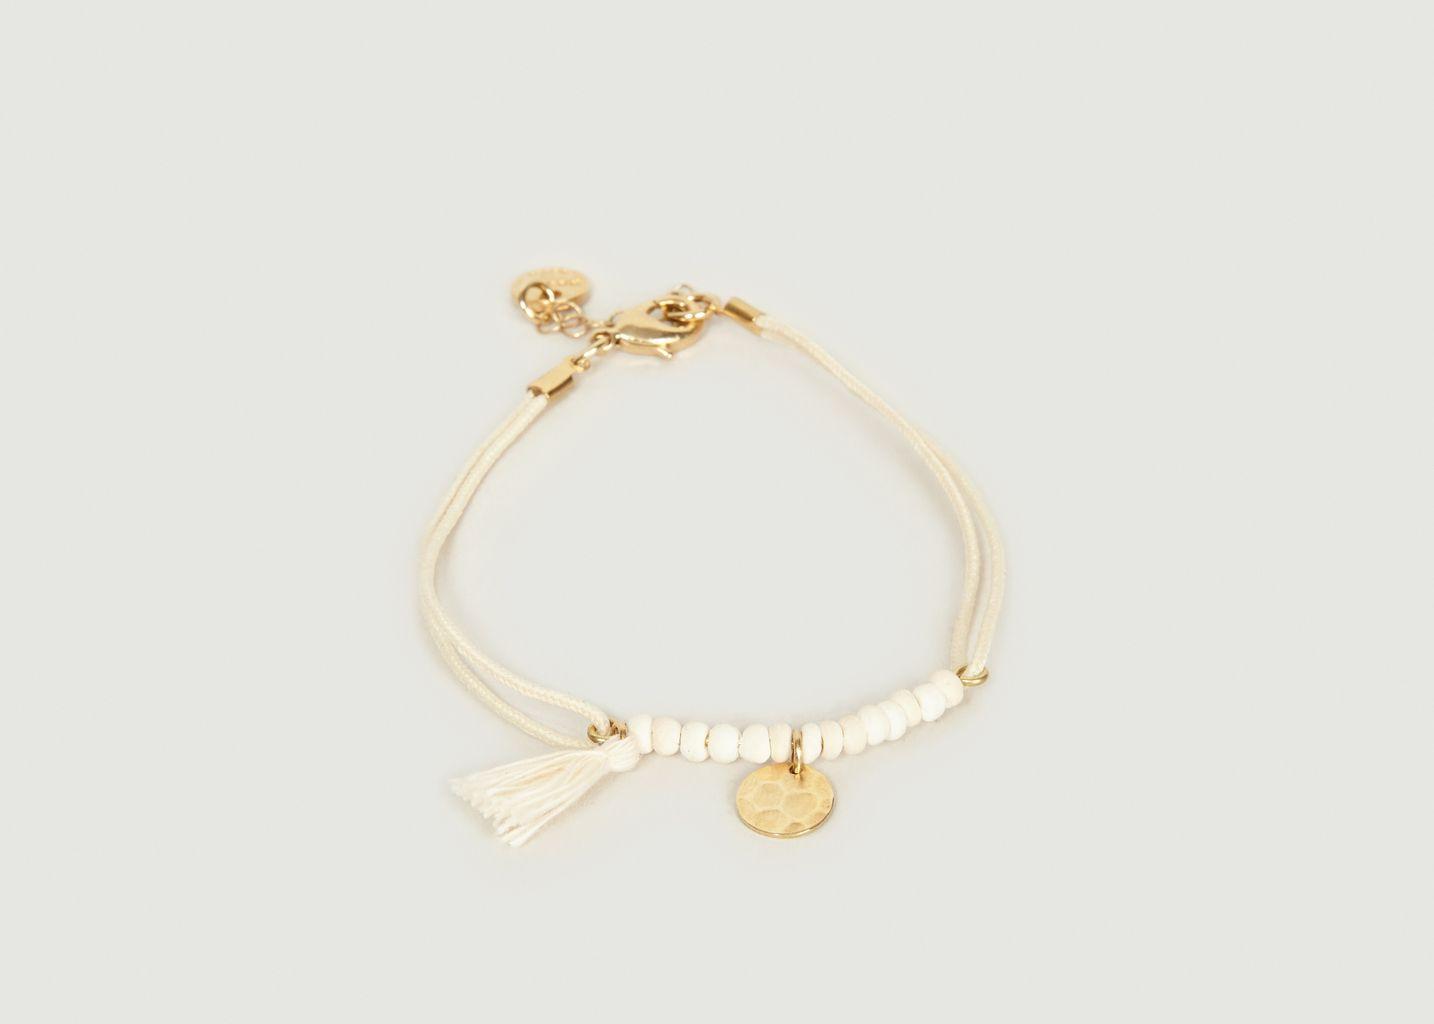 Bracelet Avec Pompon Bianca 1 - Polder